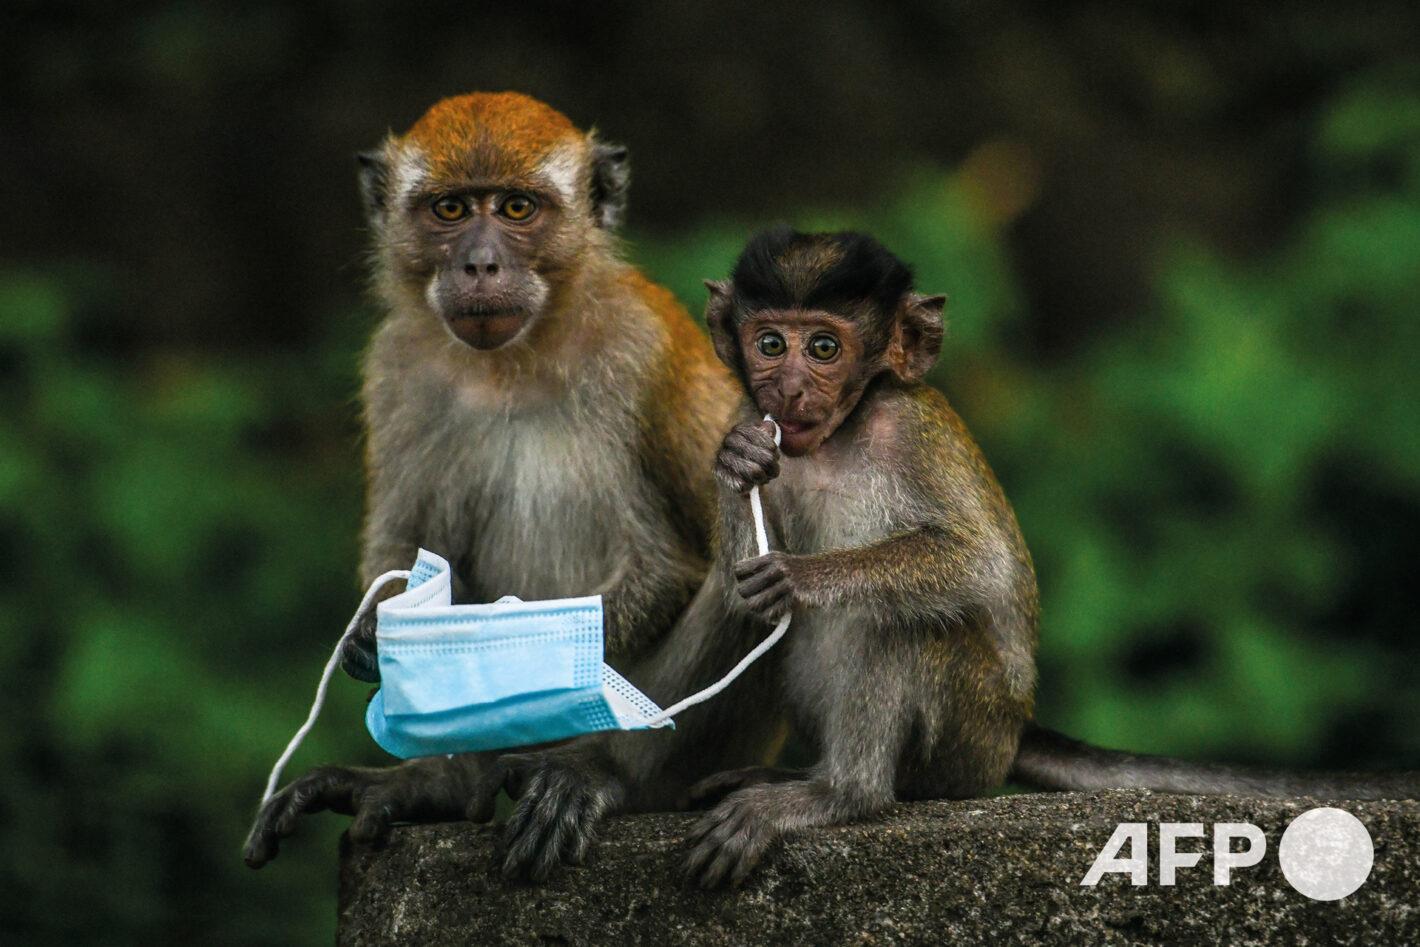 AFP 11 | Mohd RASFAN 30 octobre 2020 – Genting Sempah (Malaisie)